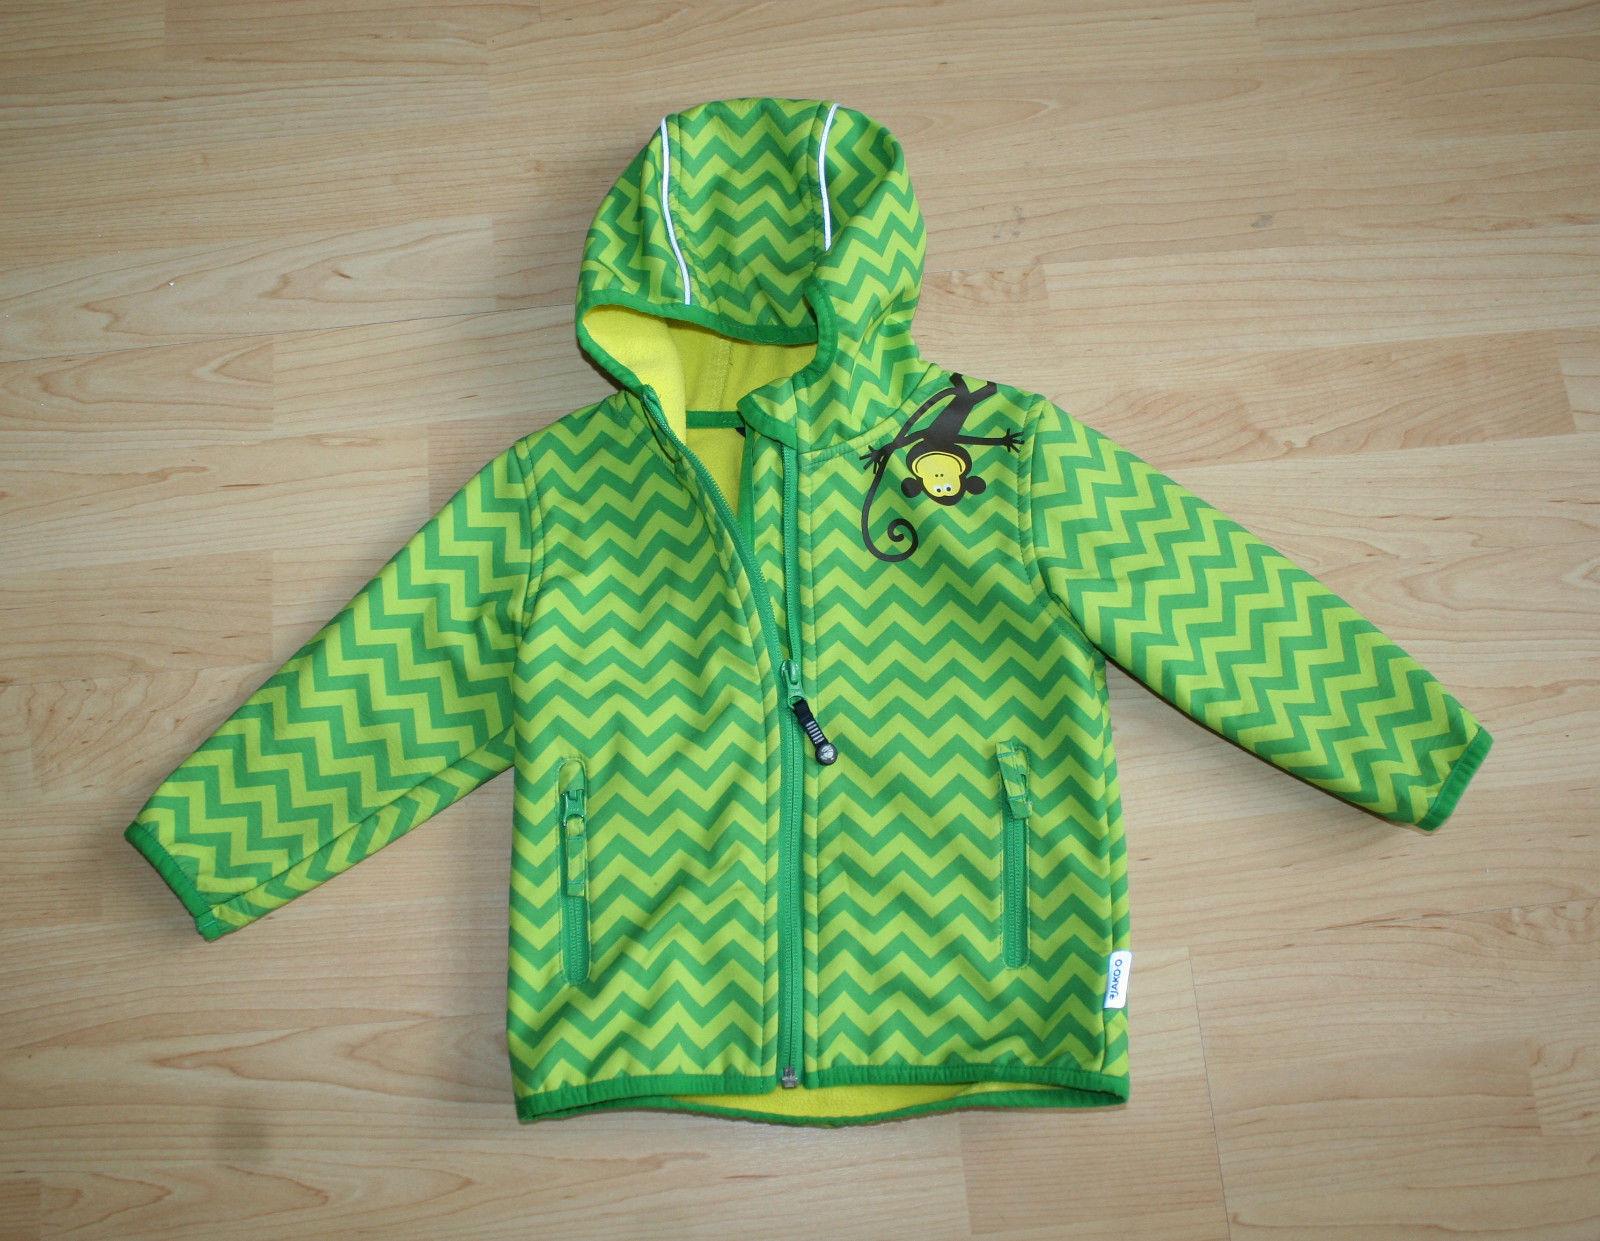 Farbenfrohe Softshell-Jacke Jako-o Größe 80/86 unisex Übergangs Mantel Anorak